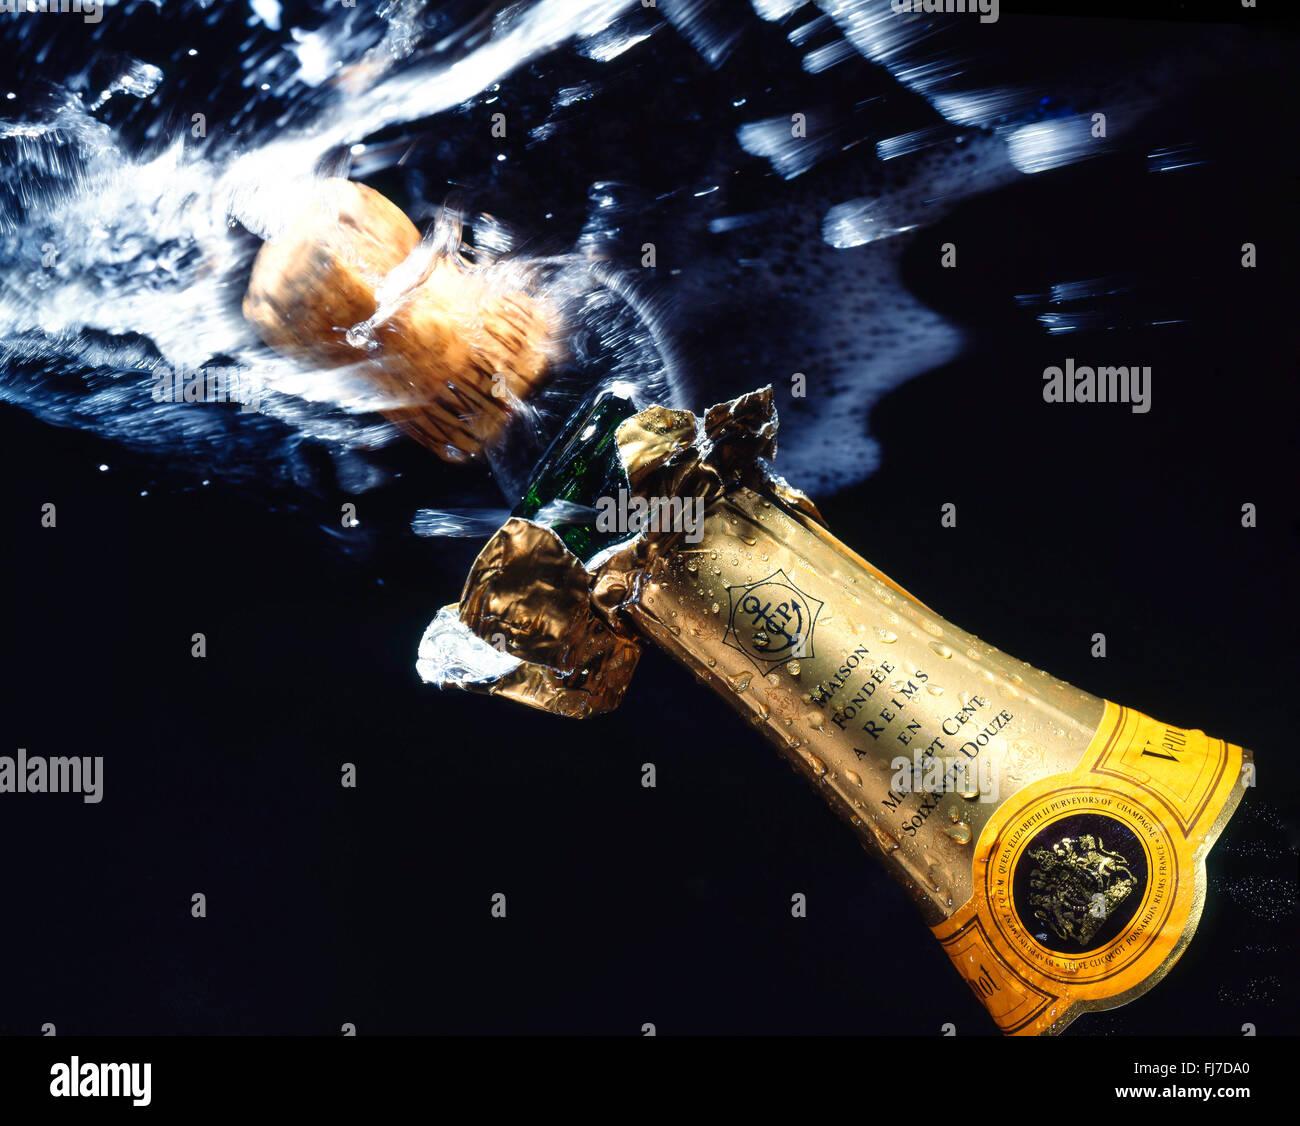 Veuve Clicquot Champagne cork estallidos, London, England, Reino Unido Foto de stock